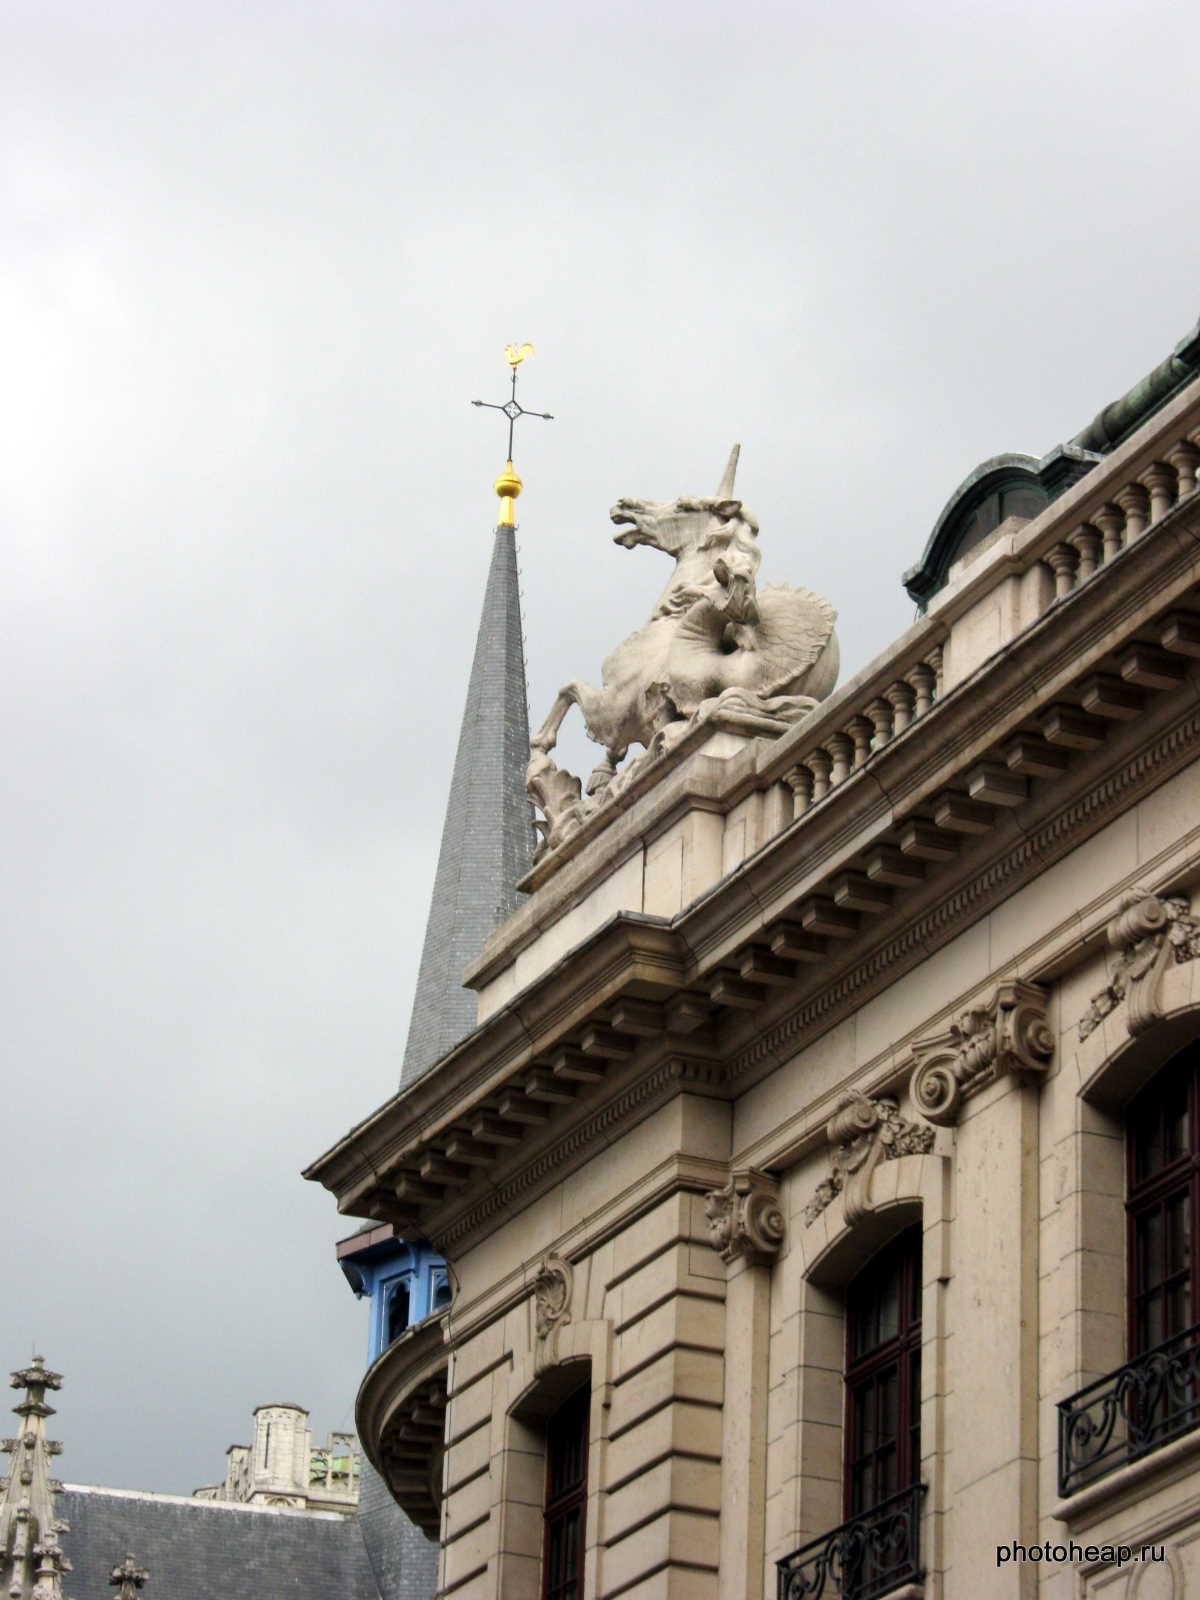 Brussels - unicorn